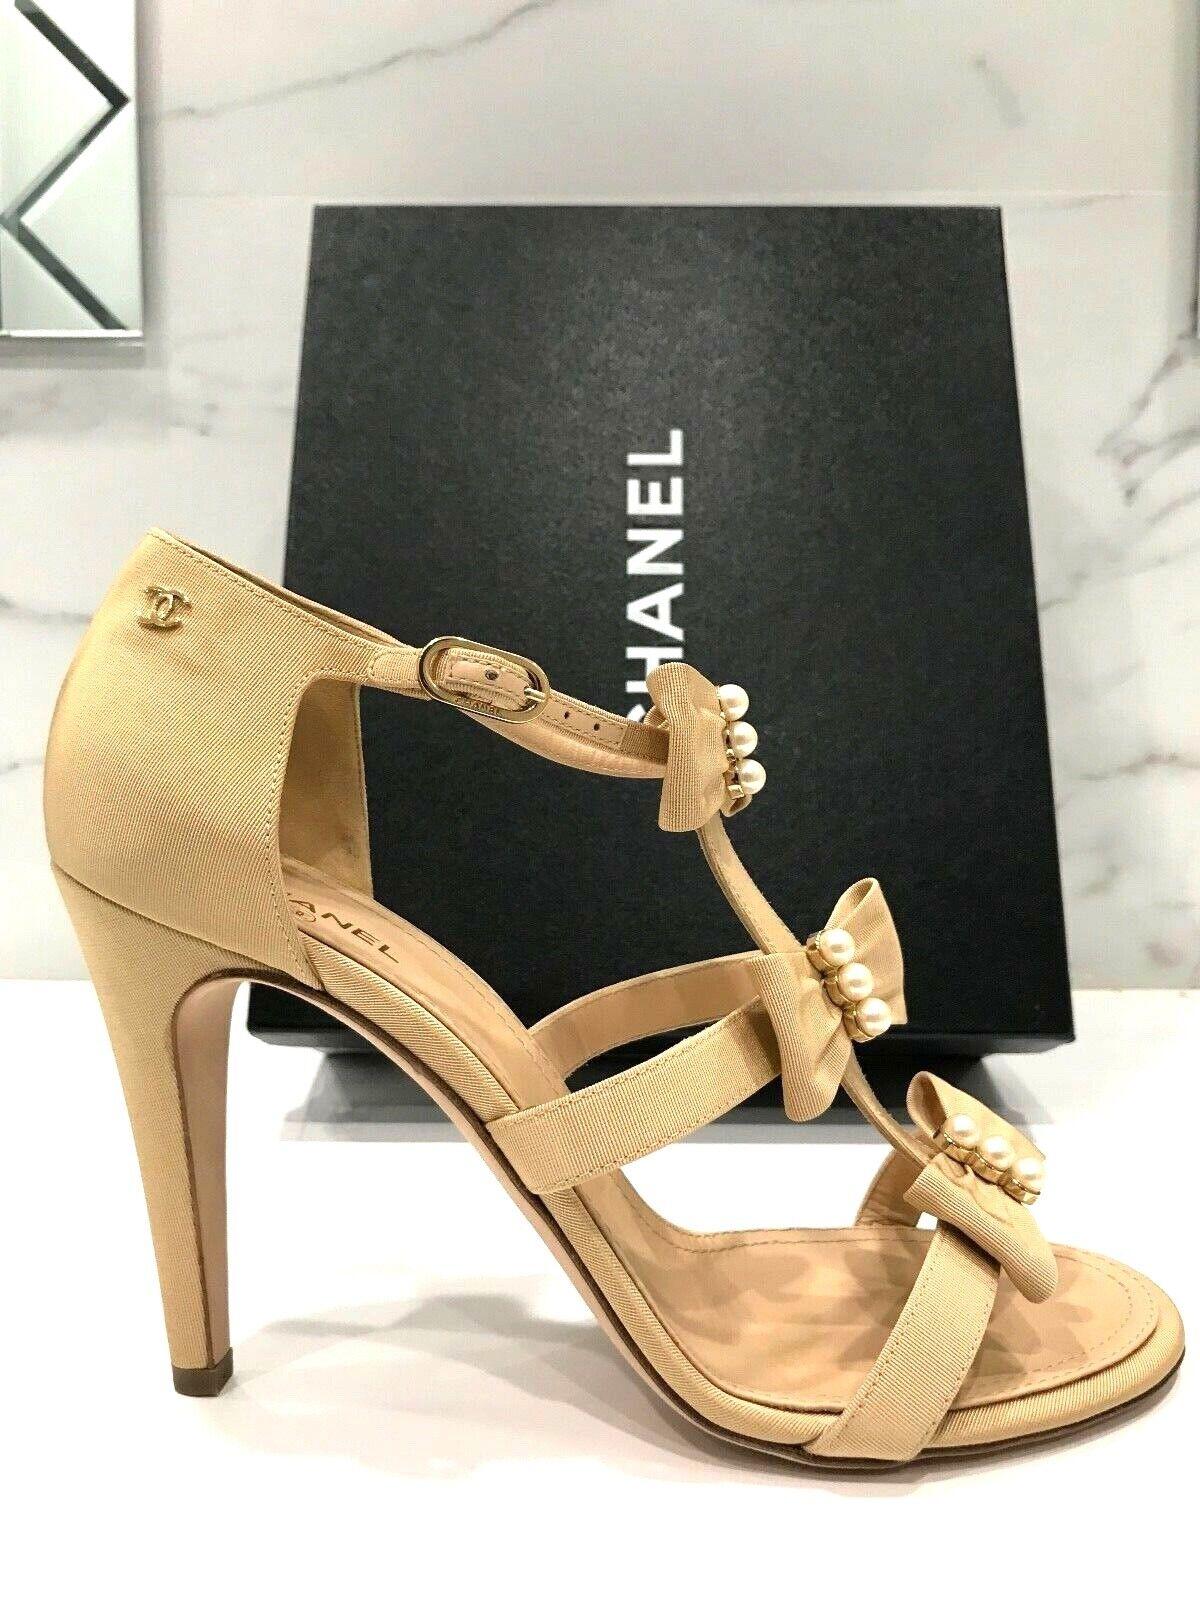 NIB Chanel Grosgrain Beige Satin Pearl Bow Open Strap Sandals Heels Shoes 42